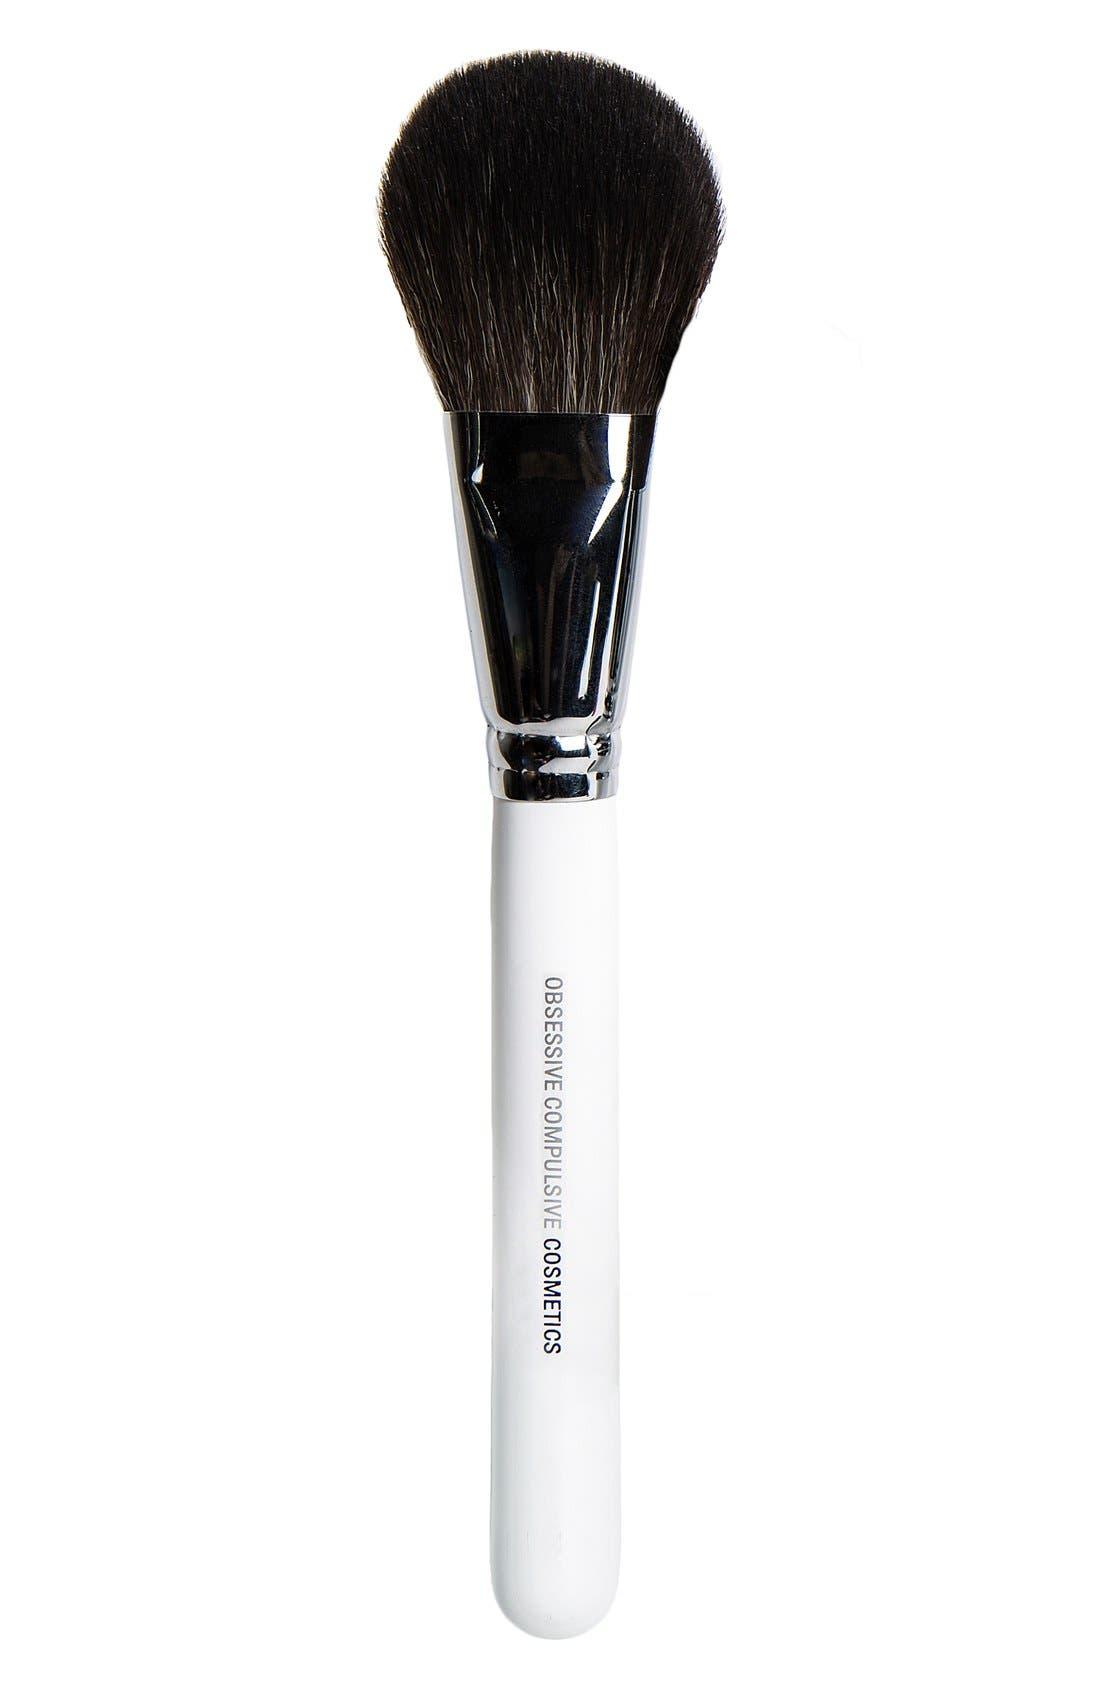 Large Powder Brush,                             Main thumbnail 1, color,                             000